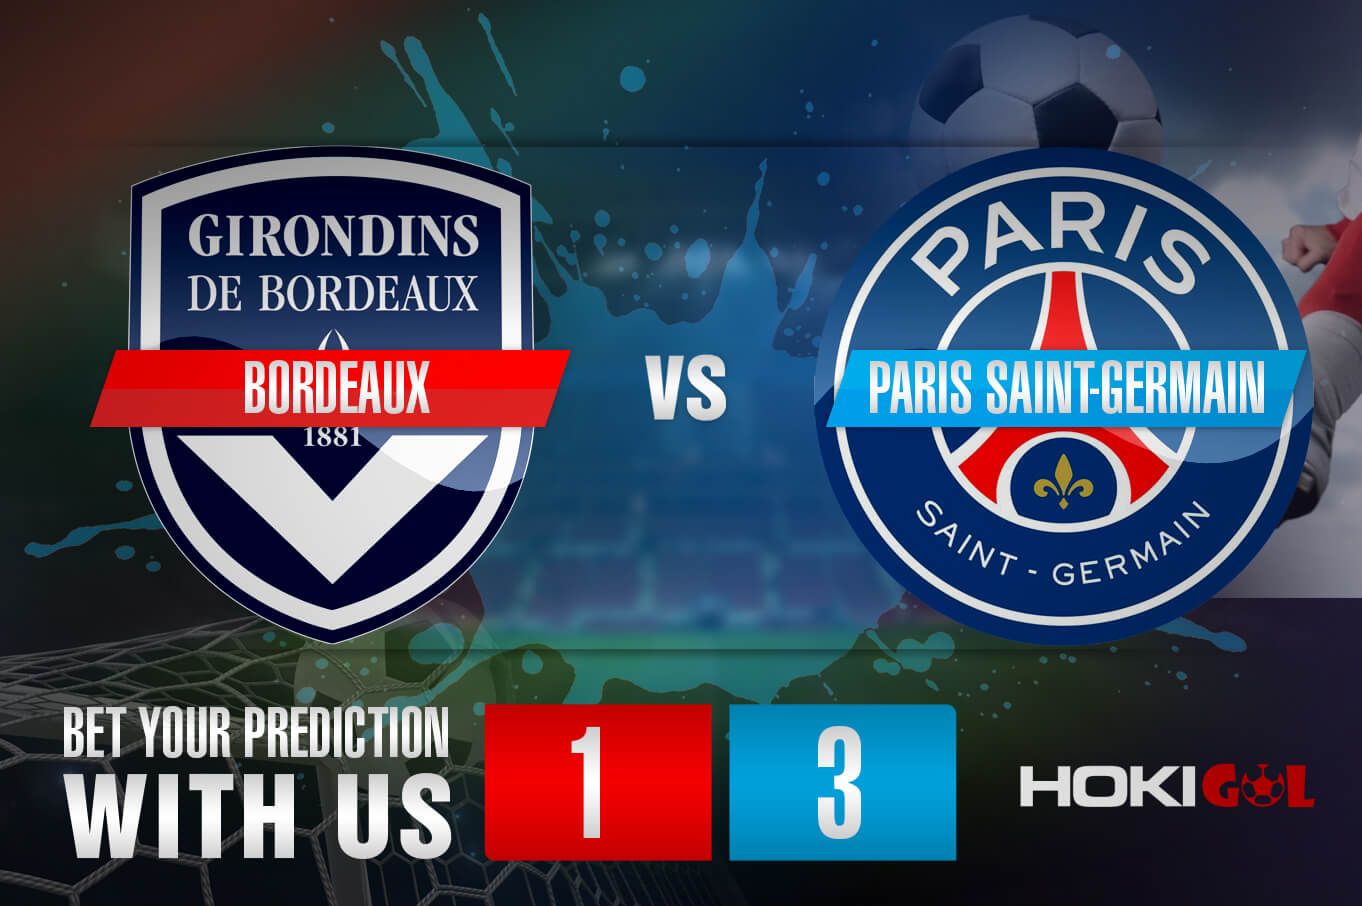 Prediksi Bola Bordeaux Vs Paris Saint-Germain 4 Maret 2021